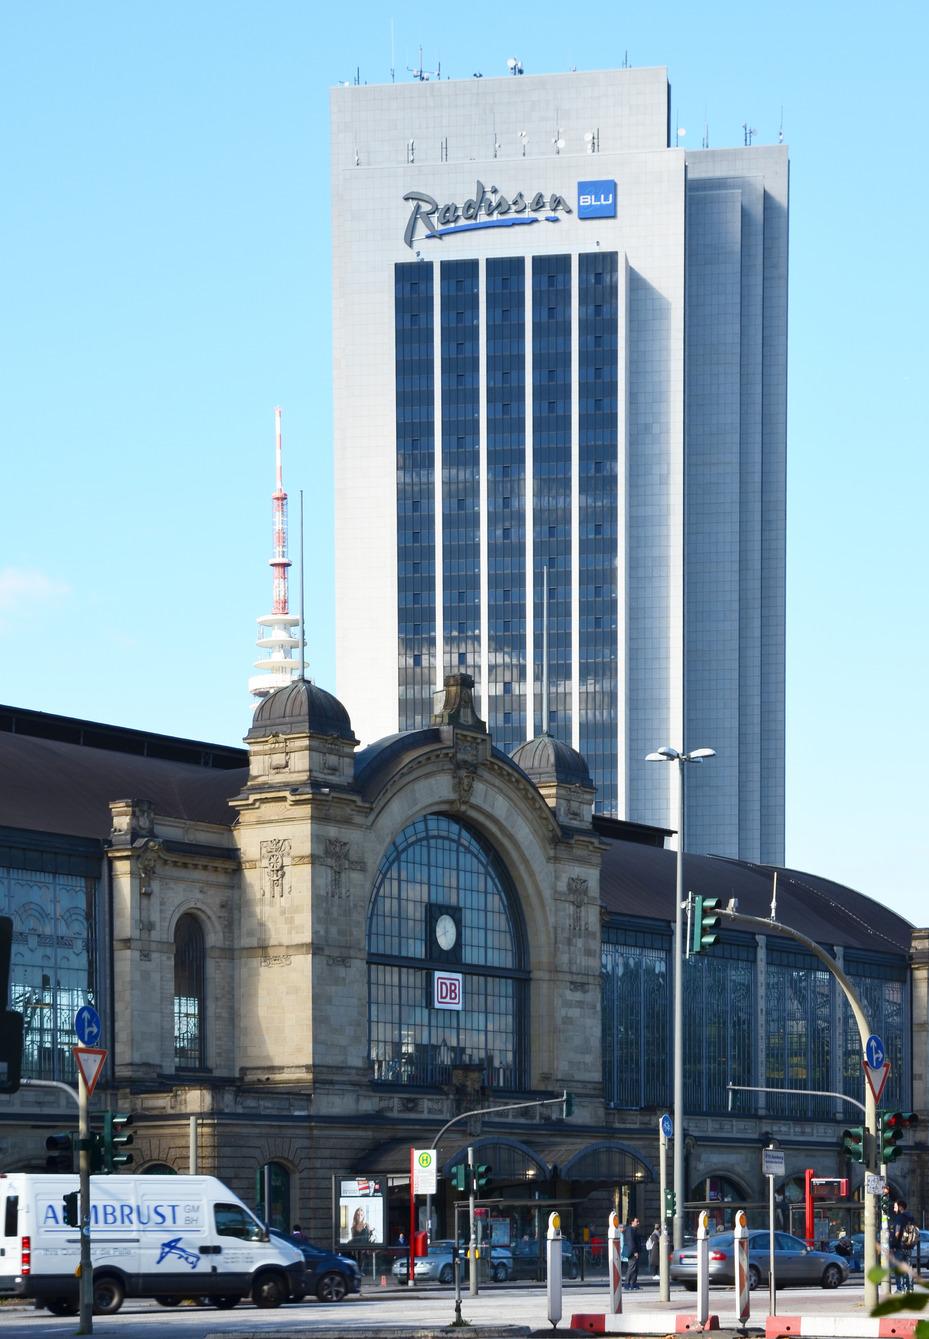 Hotel Hamburg Radisson Blue